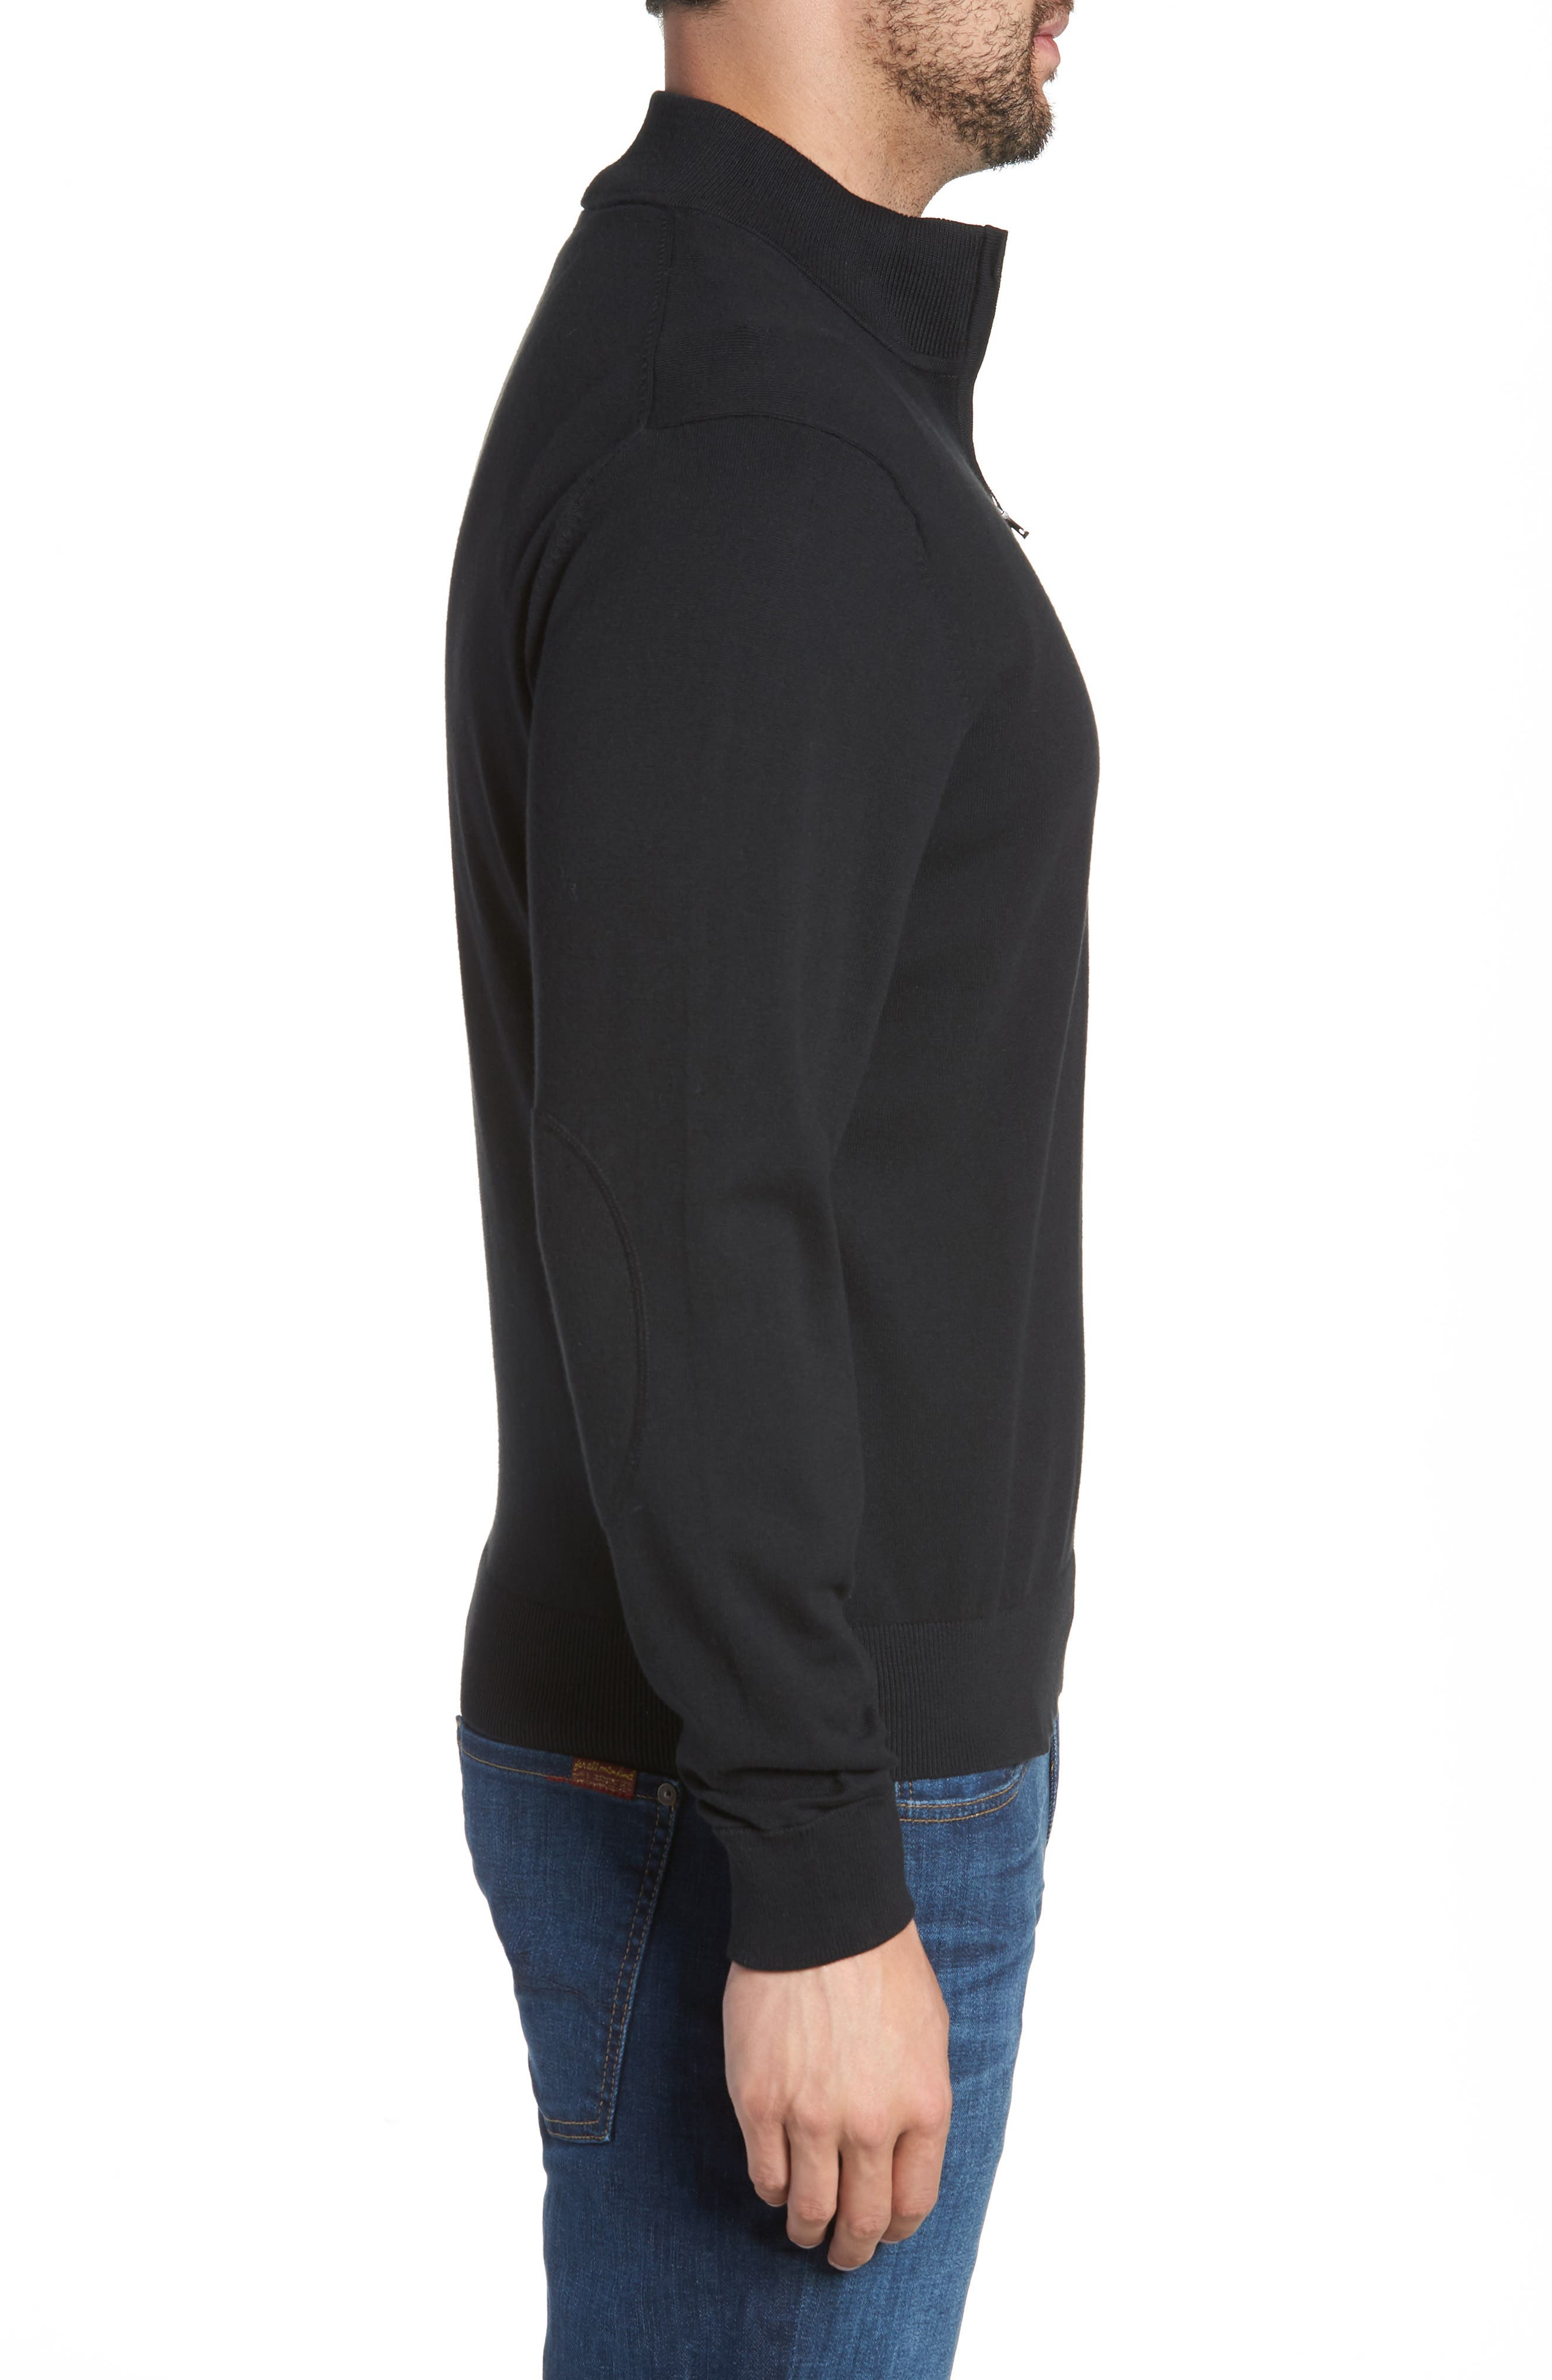 Cleveland Browns - Lakemont Regular Fit Quarter Zip Sweater,                             Alternate thumbnail 3, color,                             BLACK